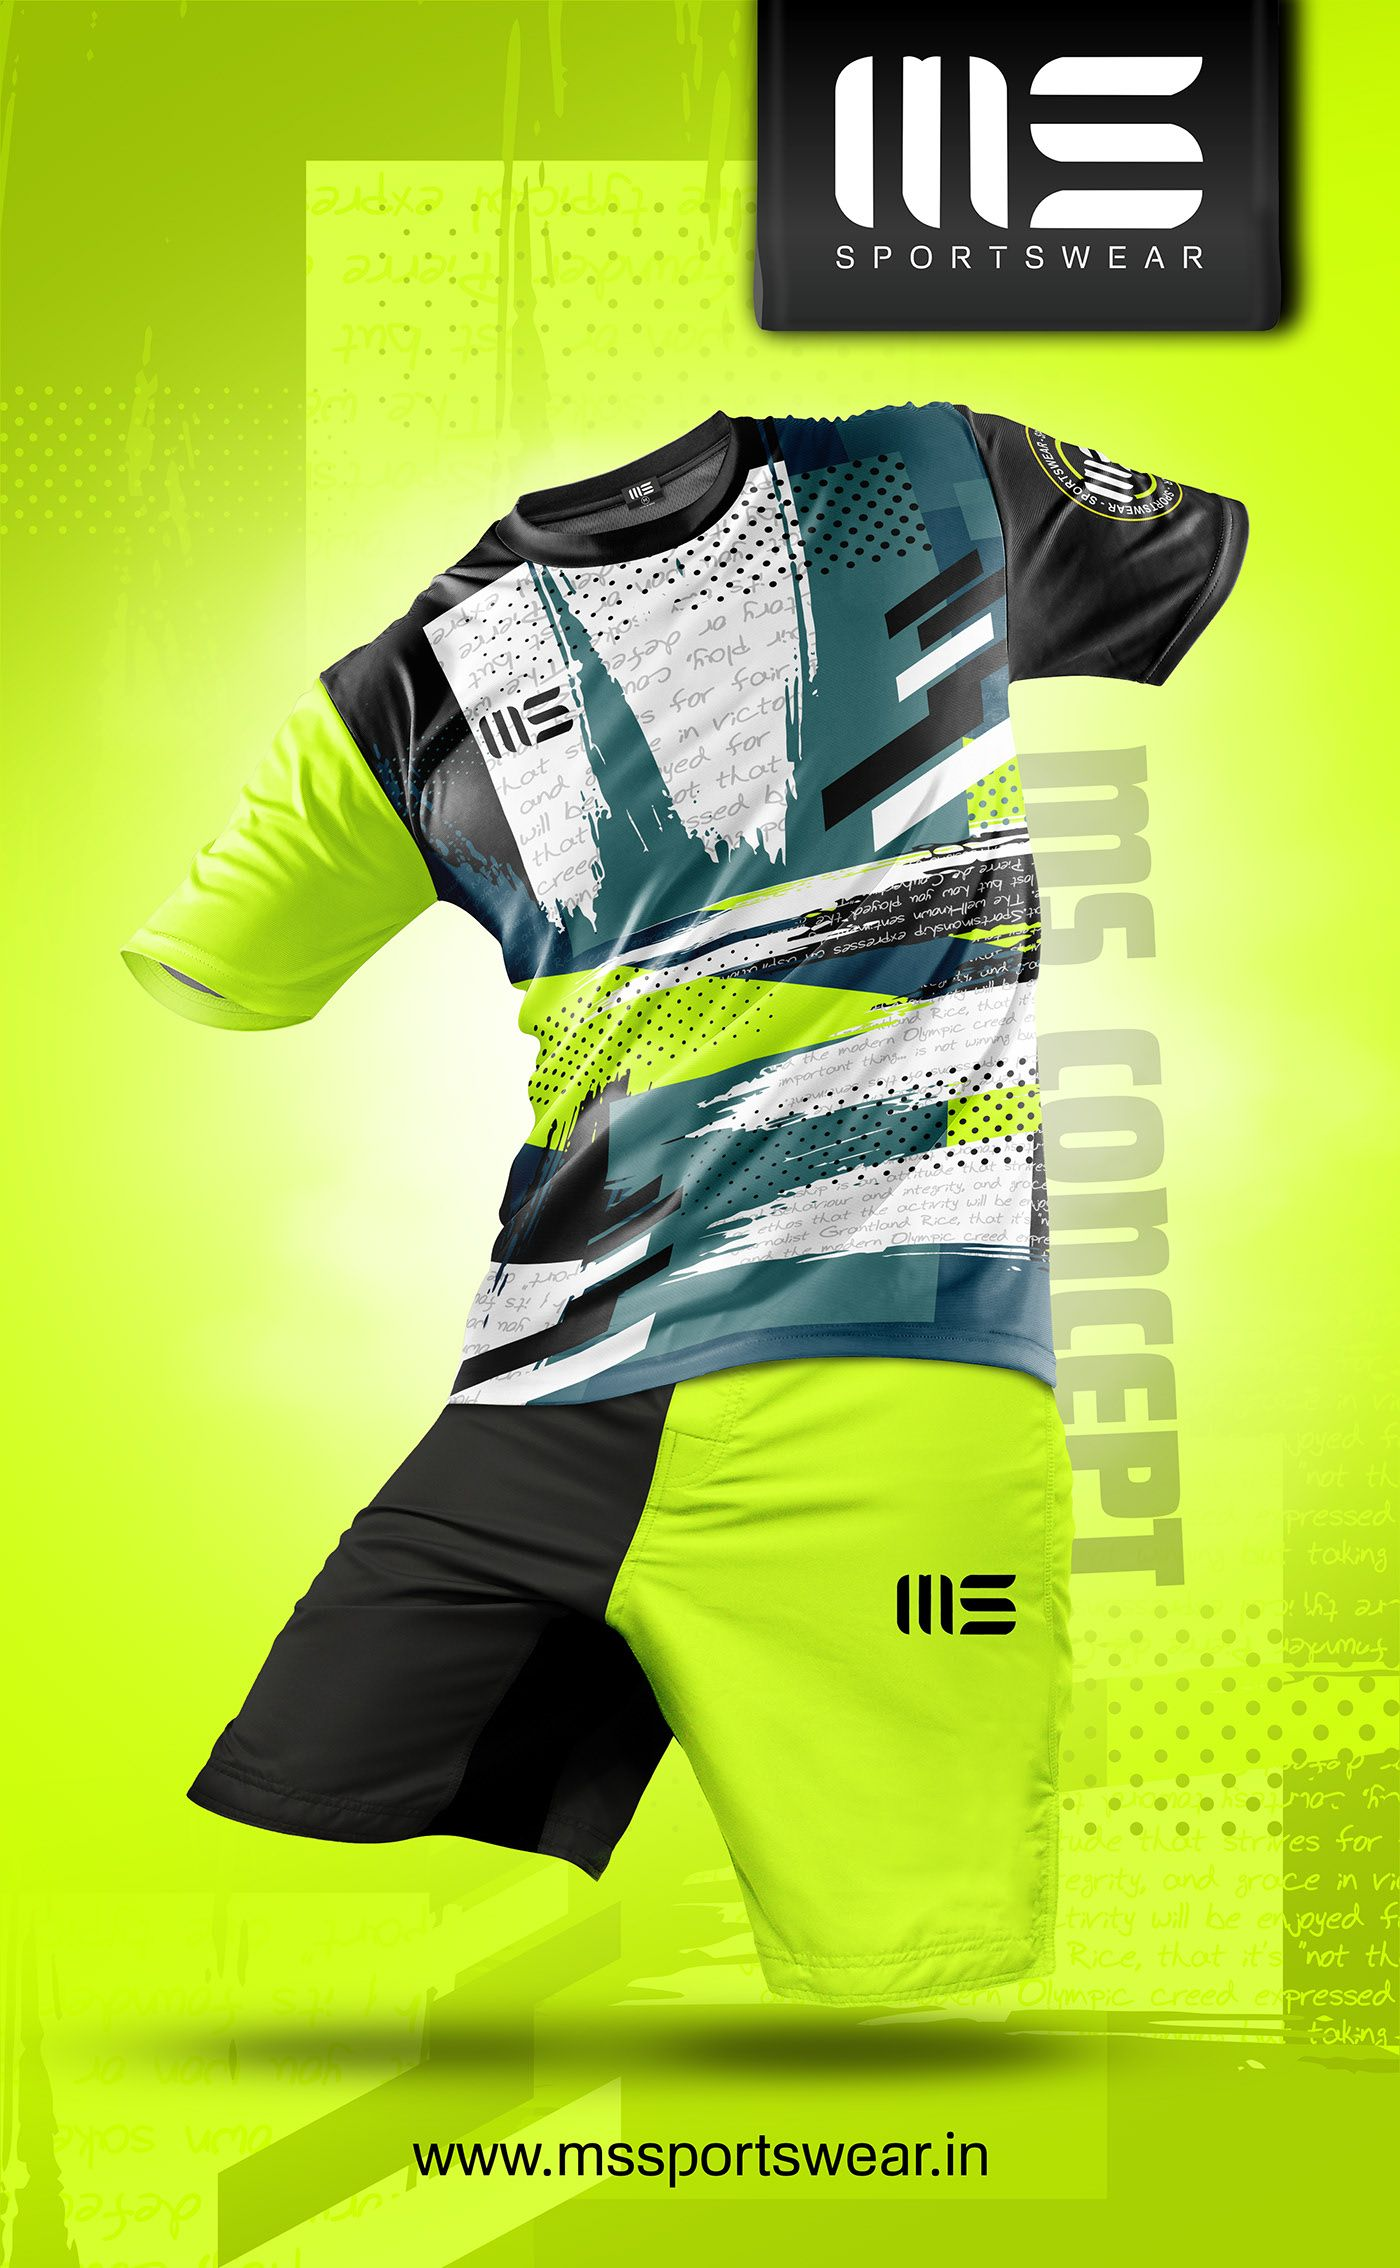 Download Ms Sportswear On Behance In 2020 Football Shirt Designs Sports Uniform Design Sports Tshirt Designs